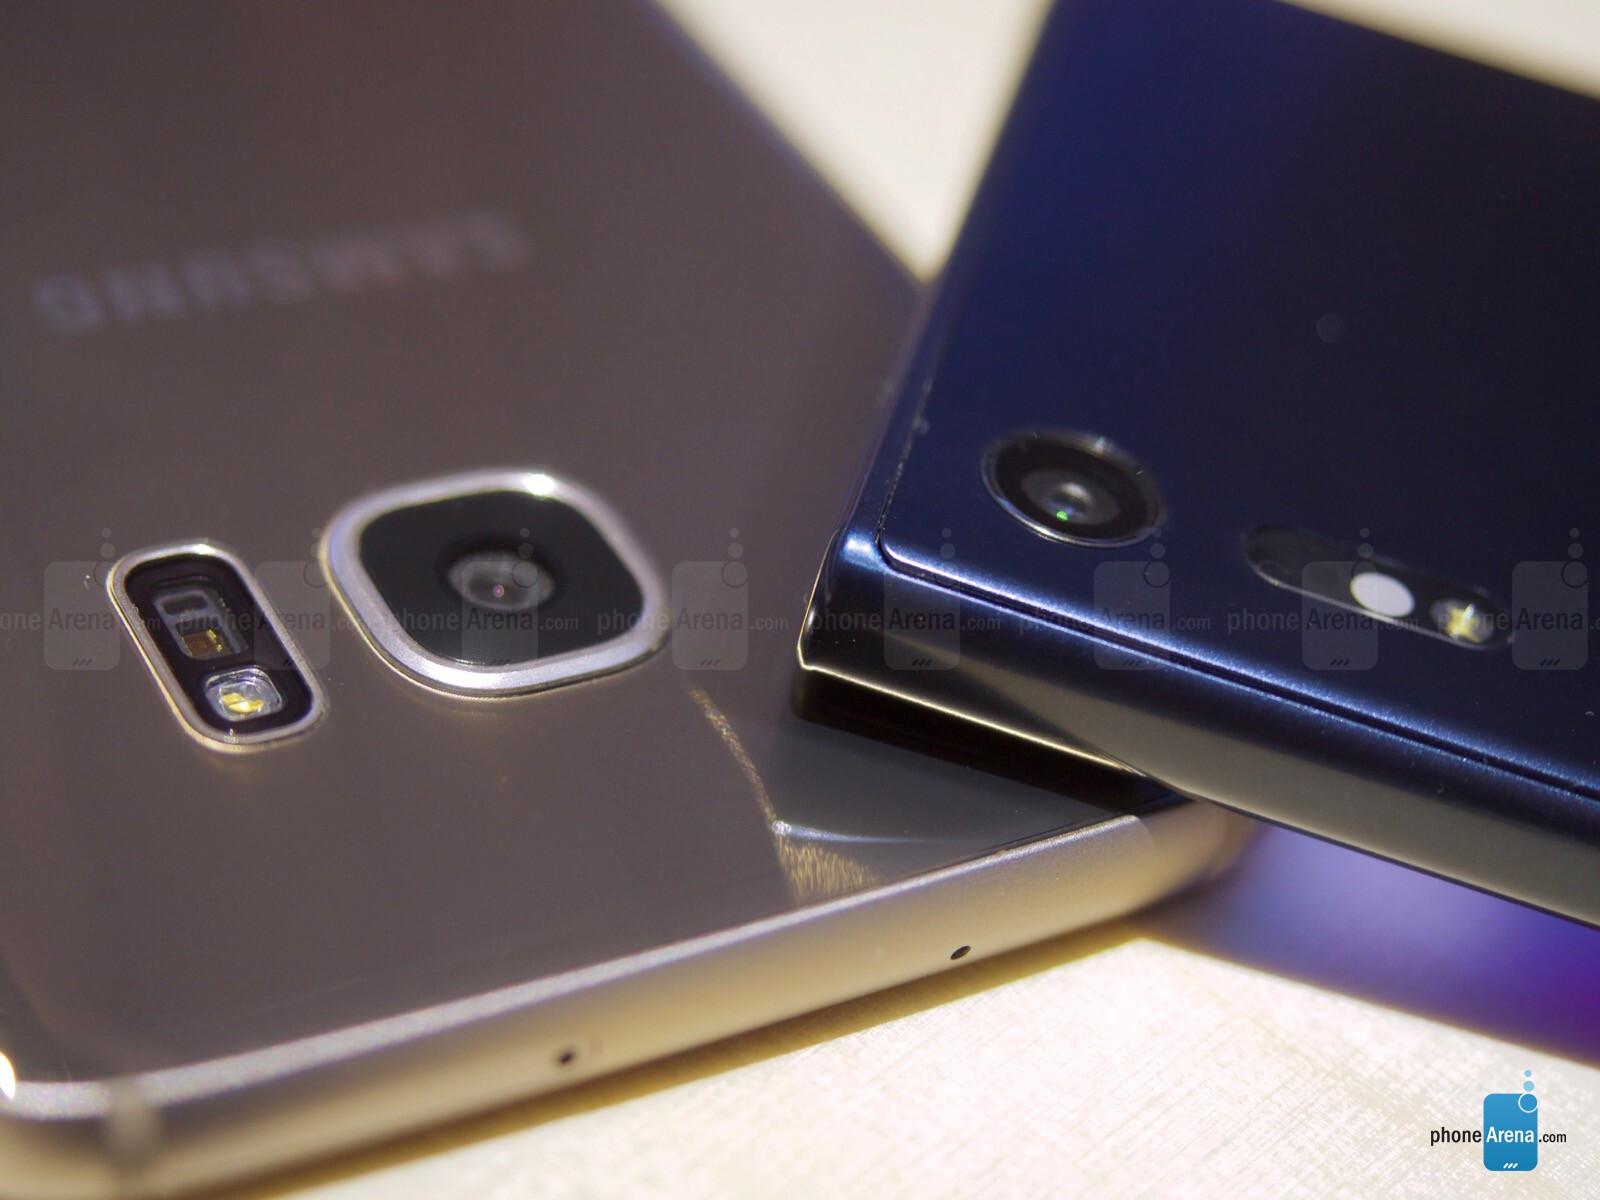 Sony Xperia XZ vs Samsung Galaxy S7 Edge: quick first look